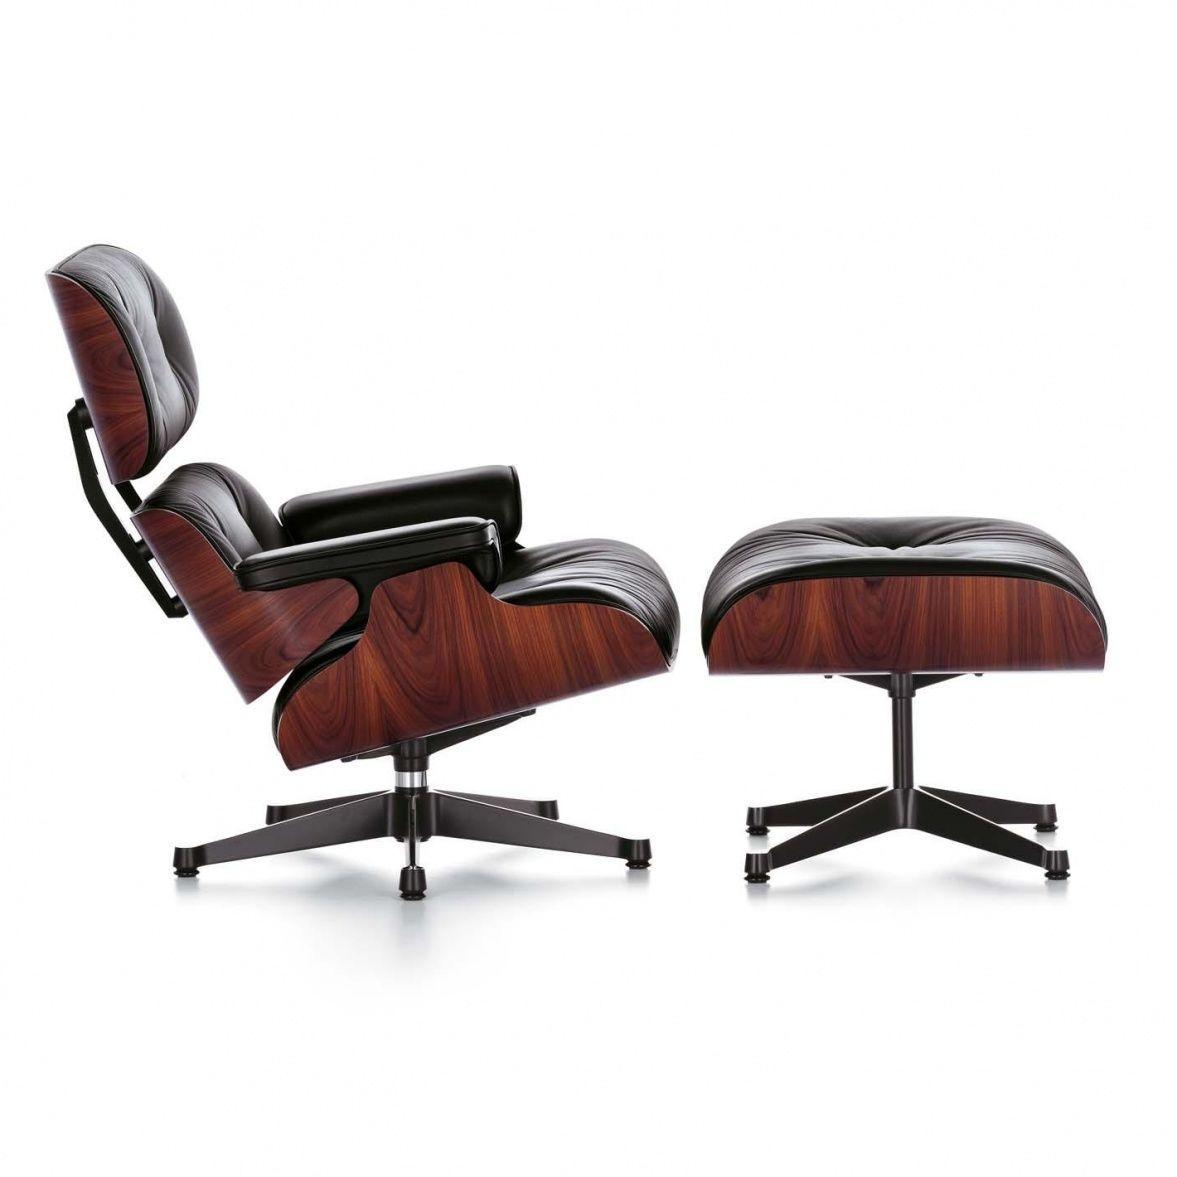 Eames Lounge Chair Sessel Ottoman Vitra Liegestuhl Eames Stuhl Sessel